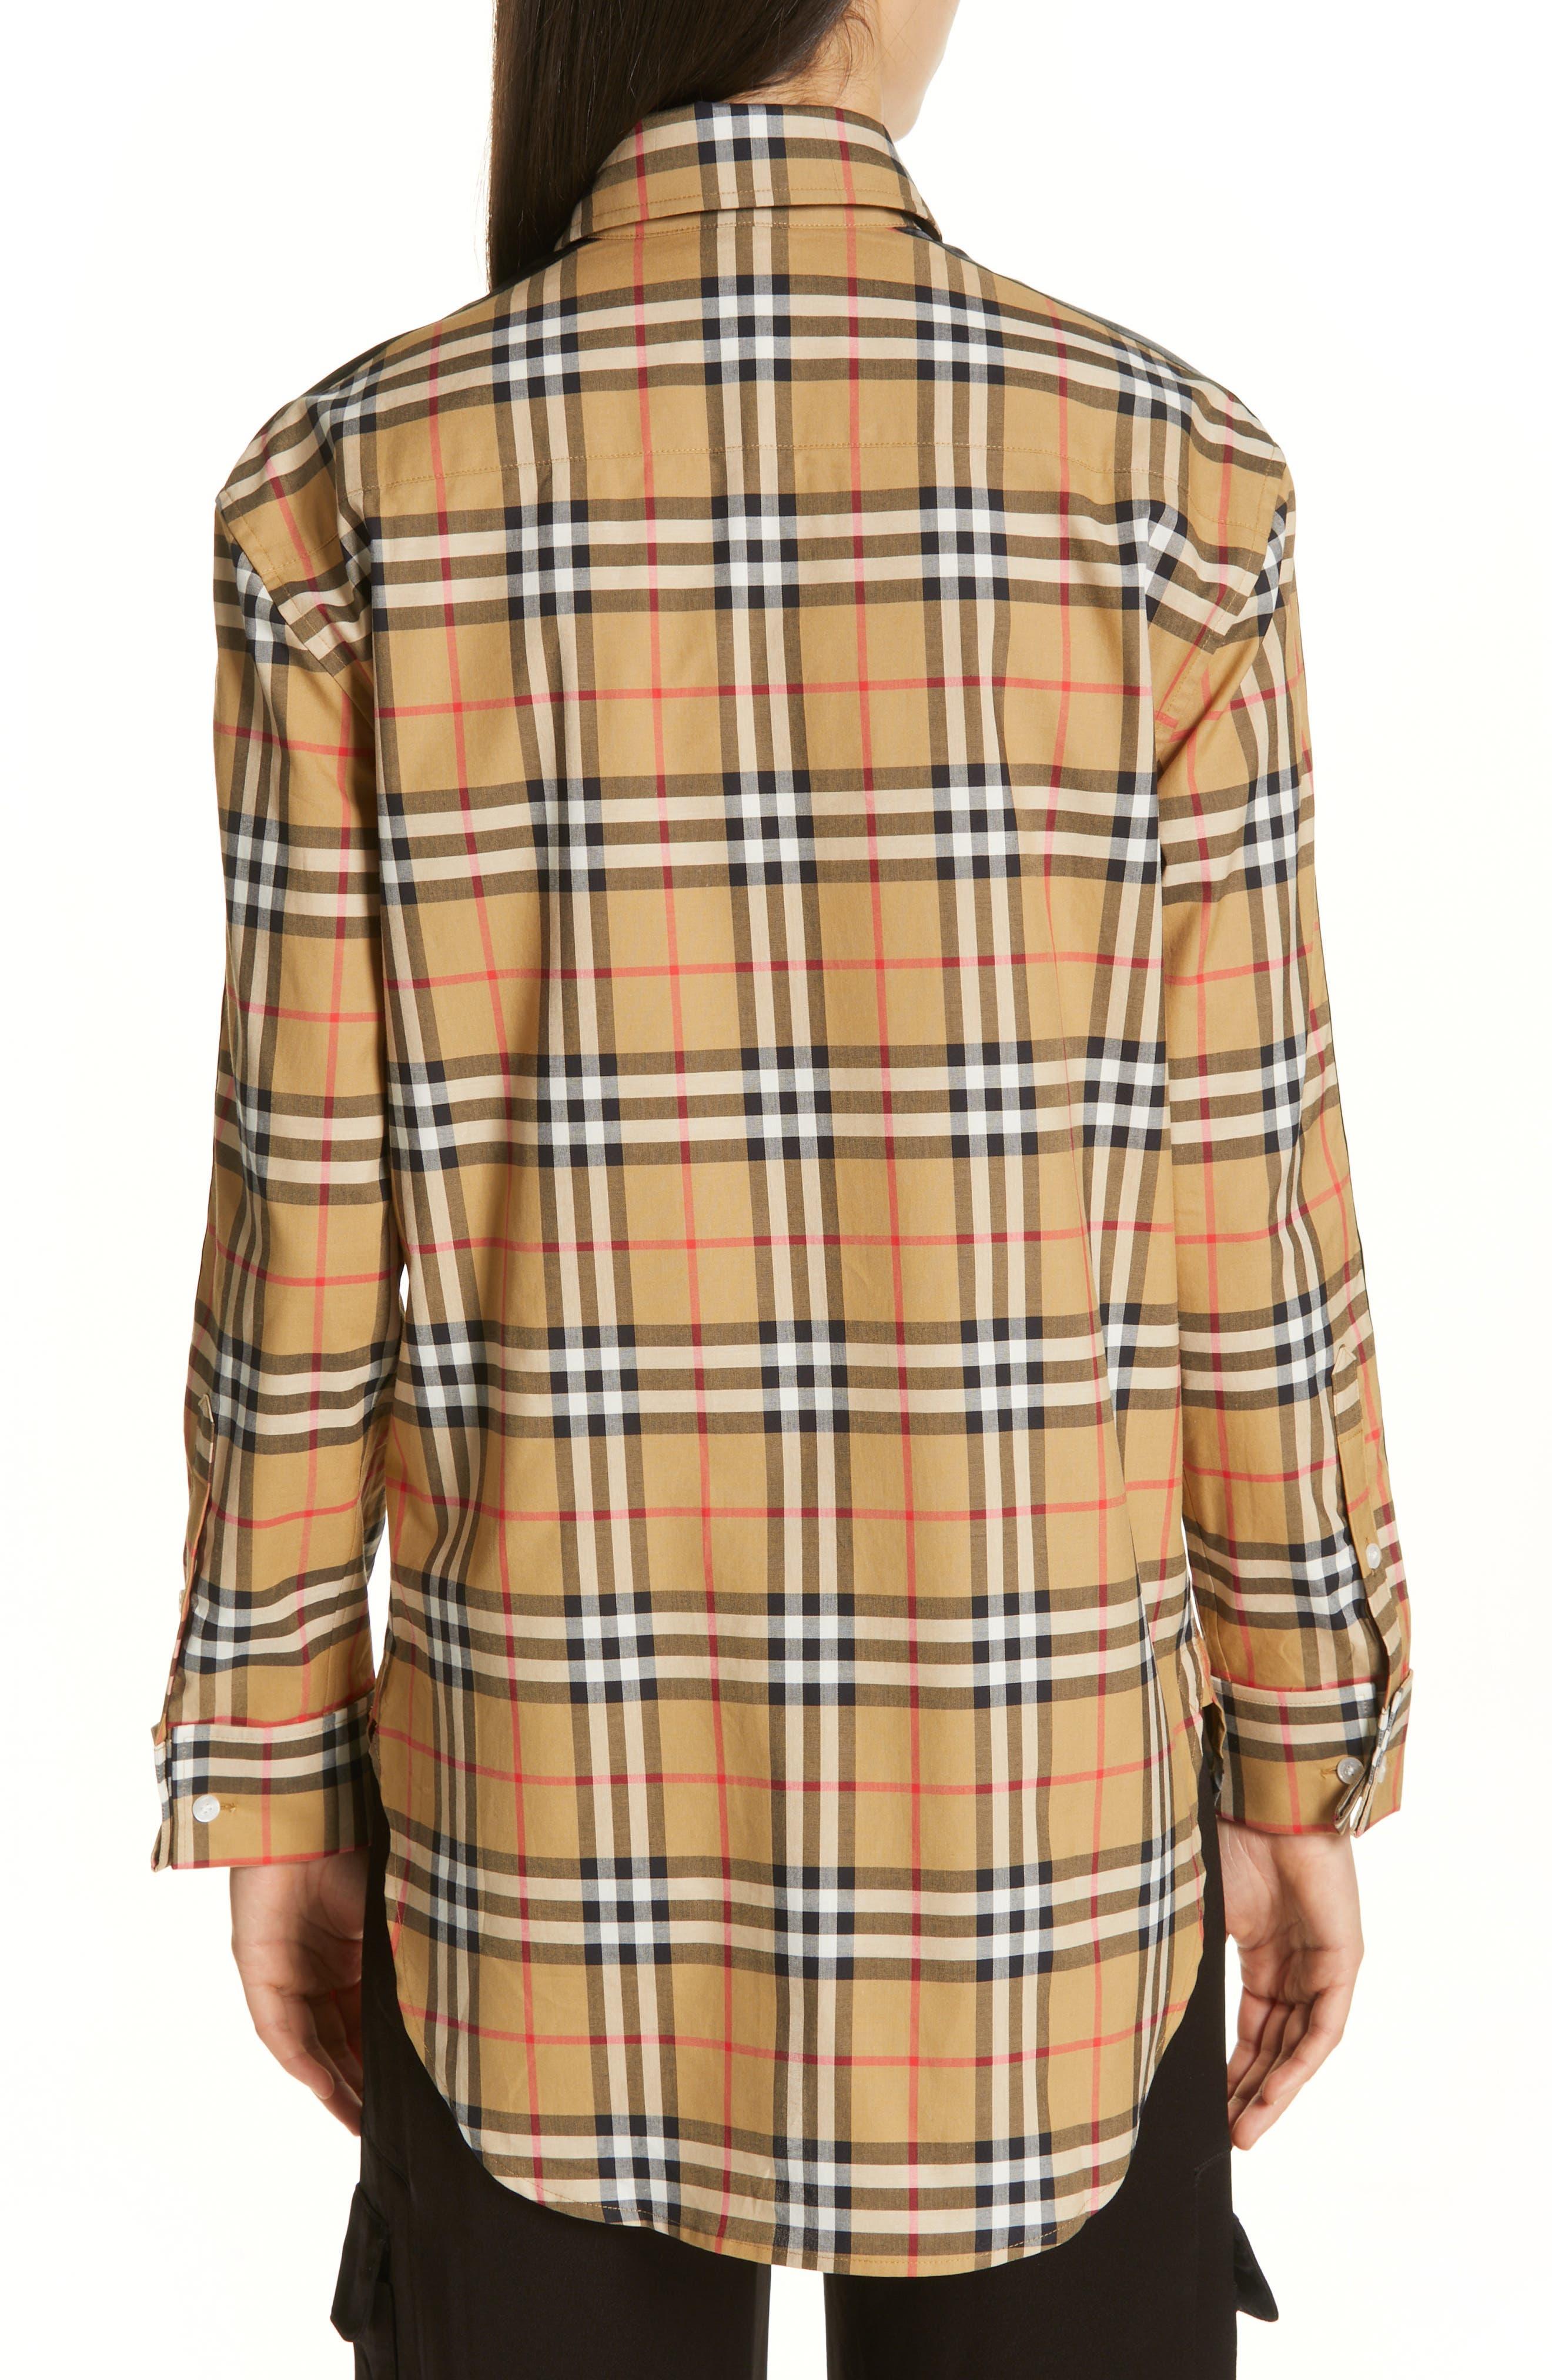 BURBERRY, Saoirse Vintage Check Cotton Shirt, Alternate thumbnail 2, color, ANTIQUE YELLOW CHECK